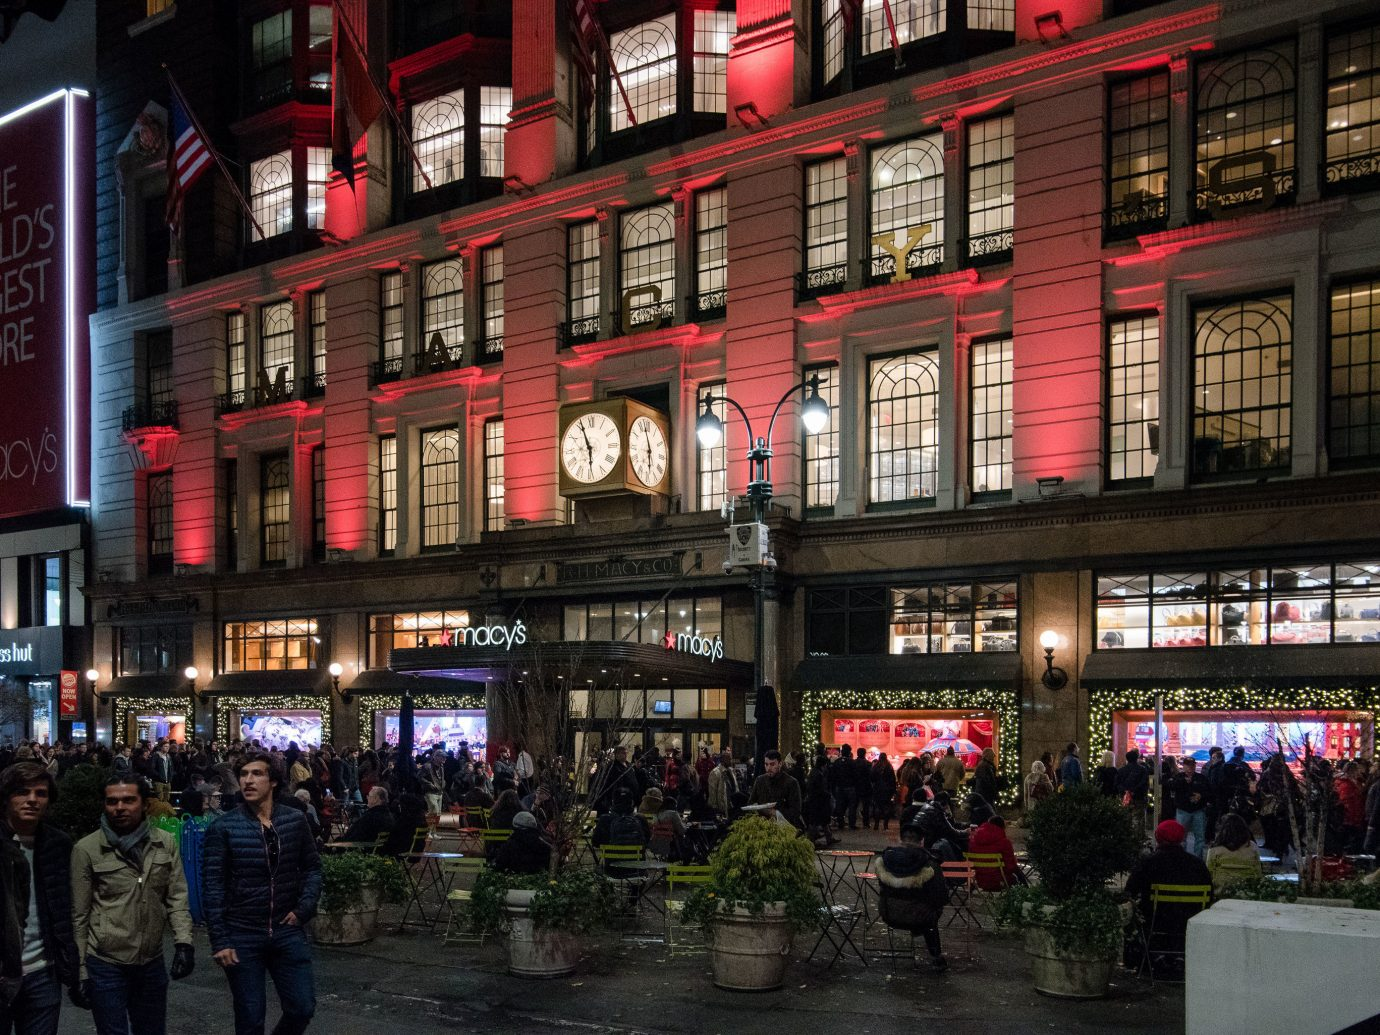 Offbeat Winter building outdoor night landmark metropolitan area City Town urban area street metropolis people neighbourhood mixed use Downtown evening marketplace facade pedestrian market shopping several